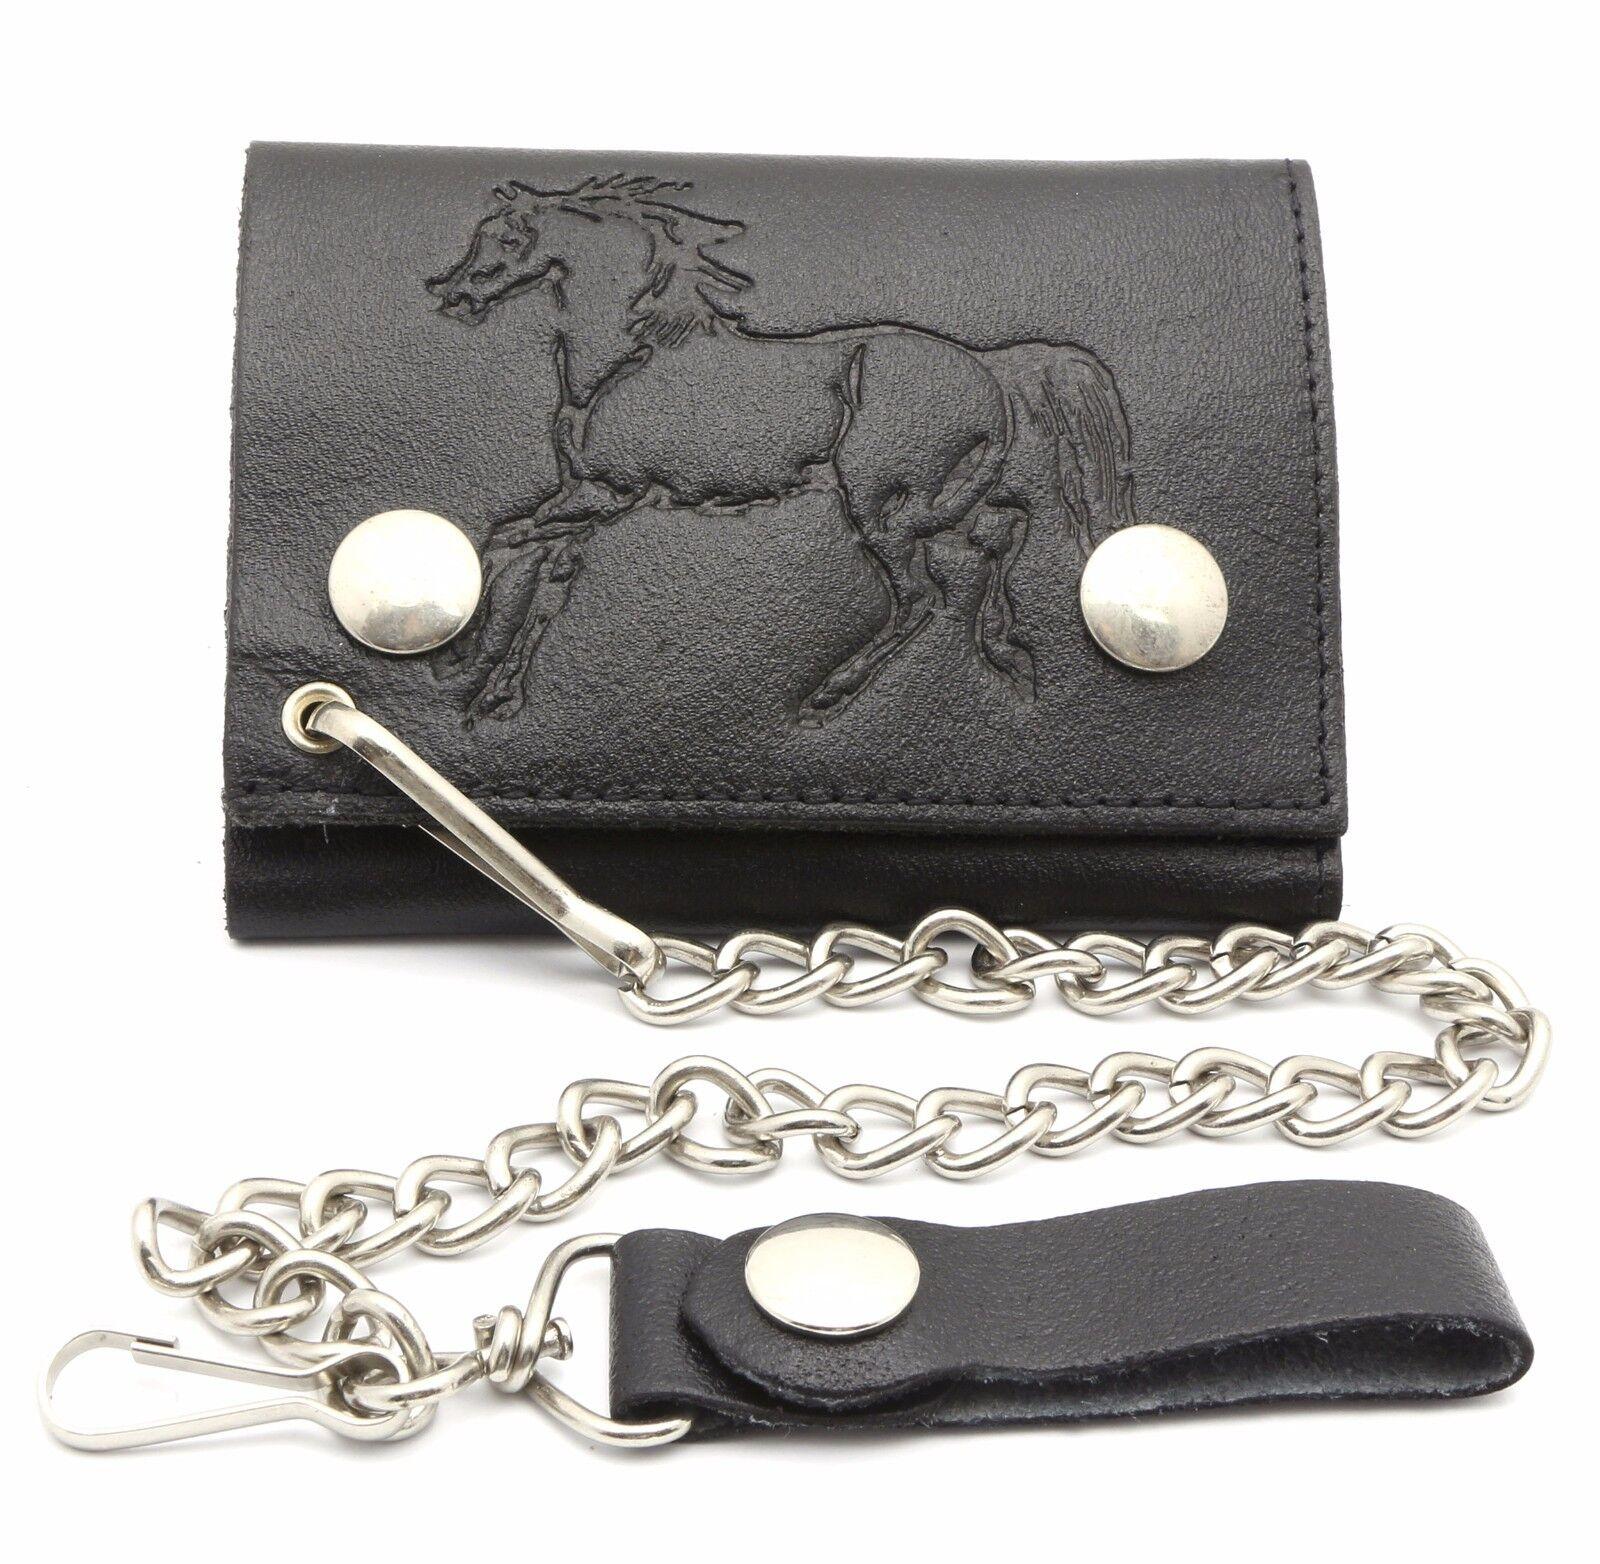 Trifold Black Leather Biker Chain Wallet Embossed Horse Design